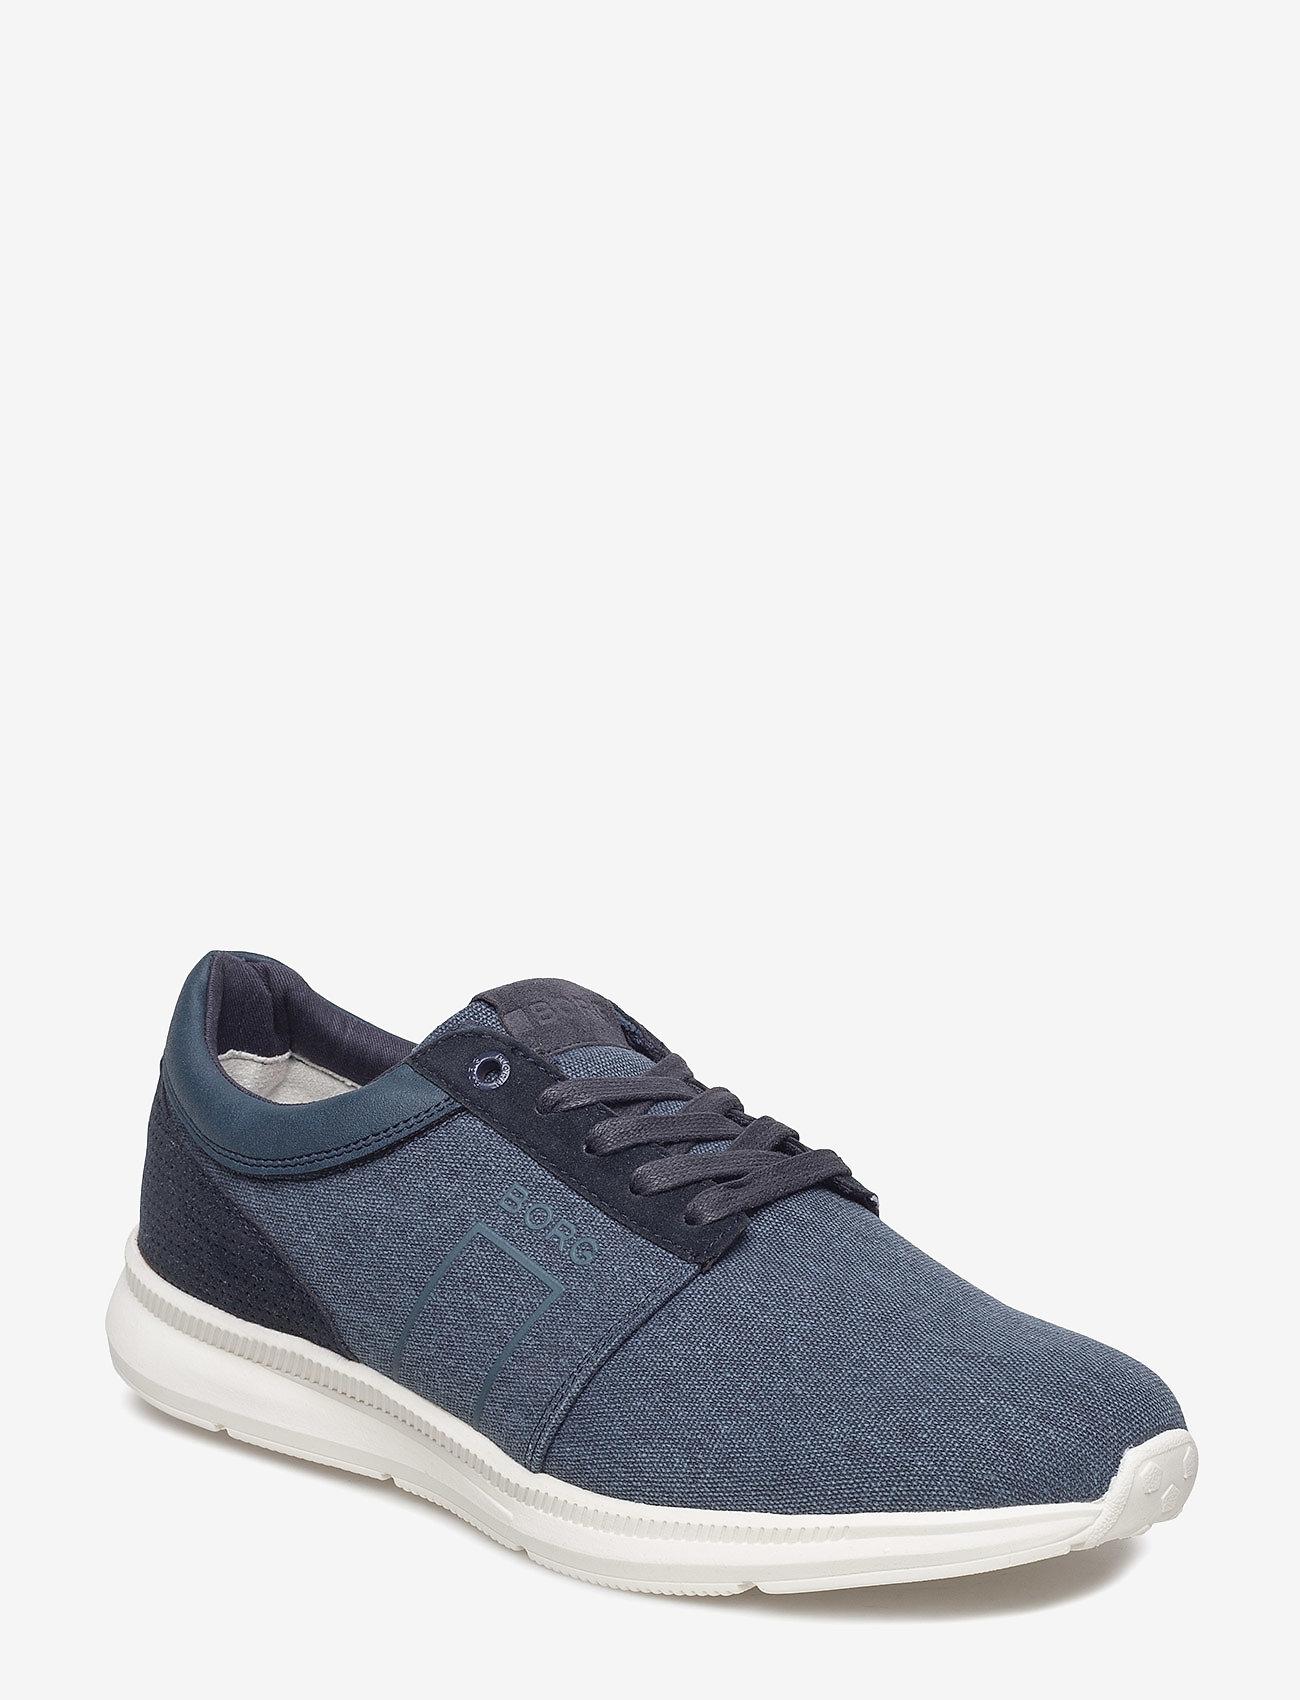 Björn Borg - R500 Low Cvs M - laag sneakers - navy - 0